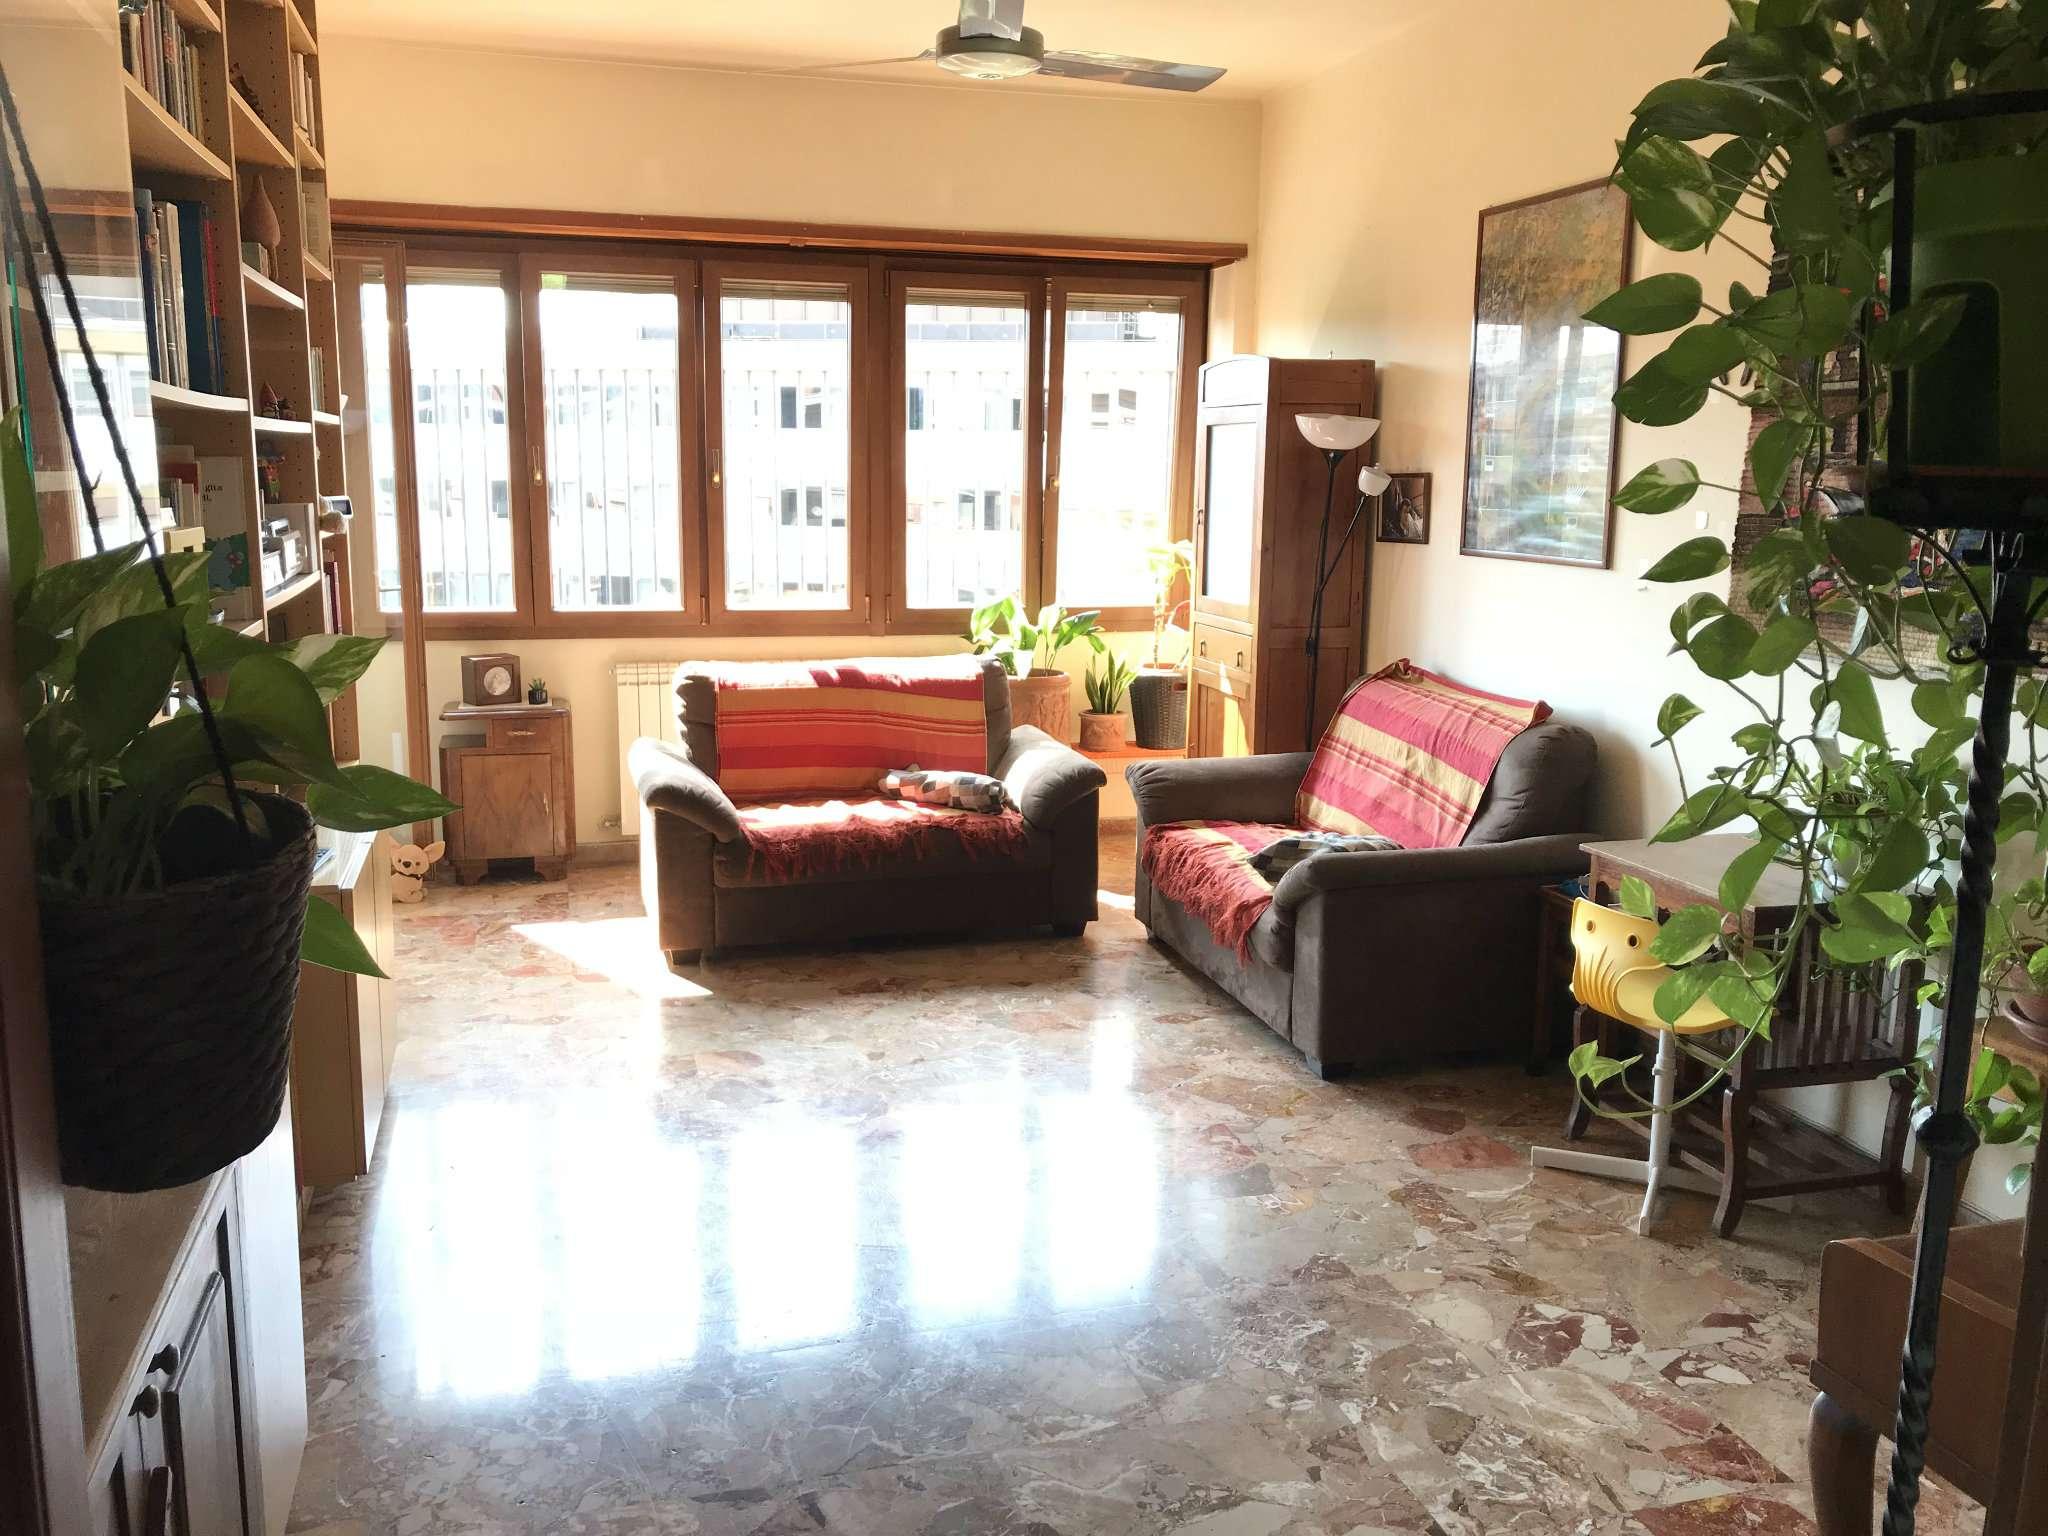 Appartamento in Vendita a Firenze Periferia Nord: 4 locali, 110 mq